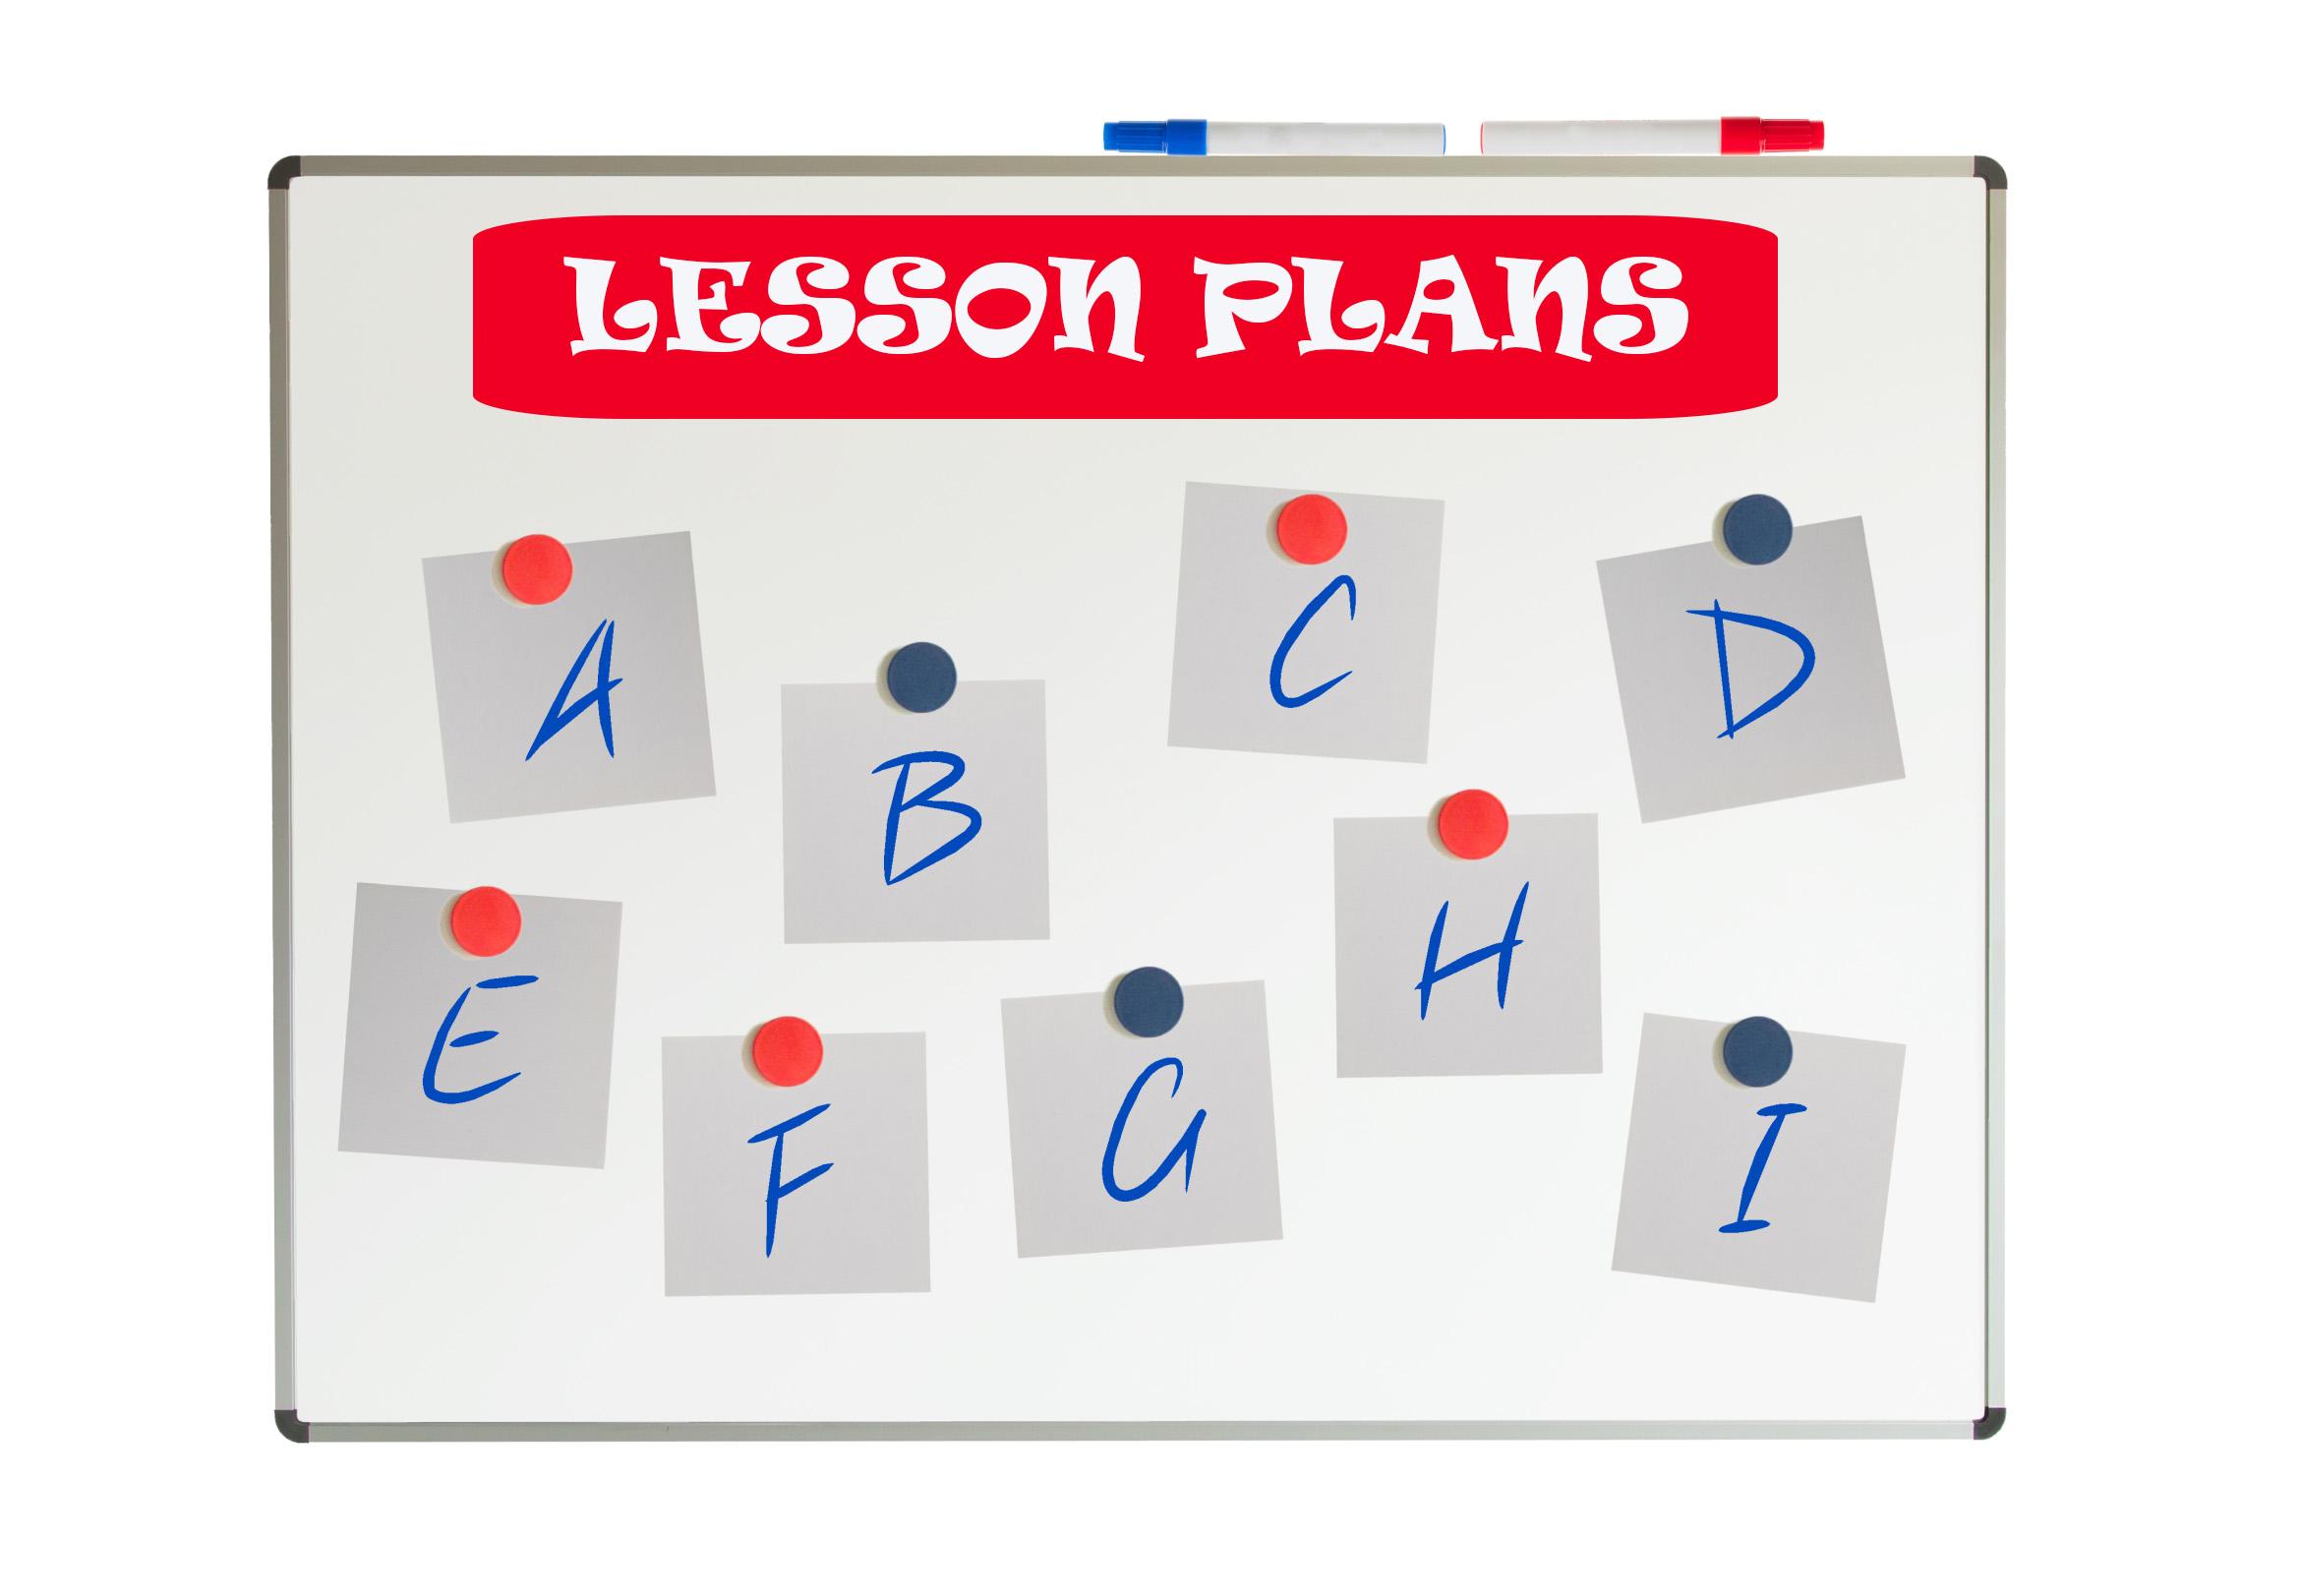 LESSON PLANNING